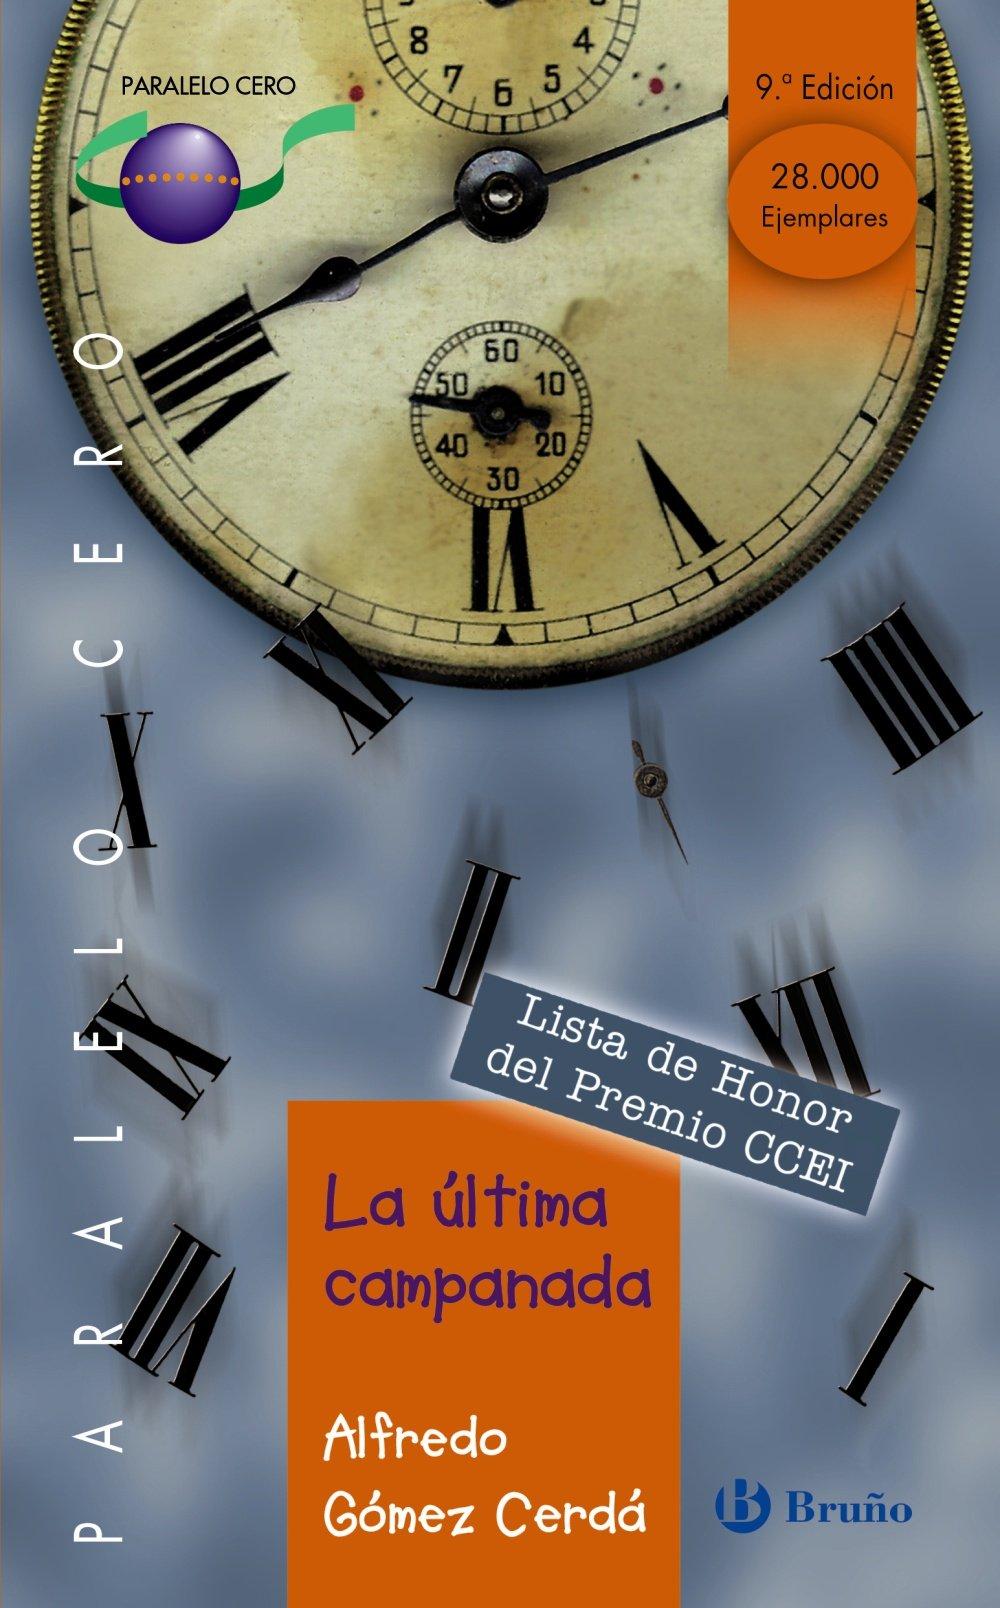 La ultima campanada/ The Last Chime (Paralelo Cero) (Spanish Edition) (Spanish) Paperback – June 30, 2009